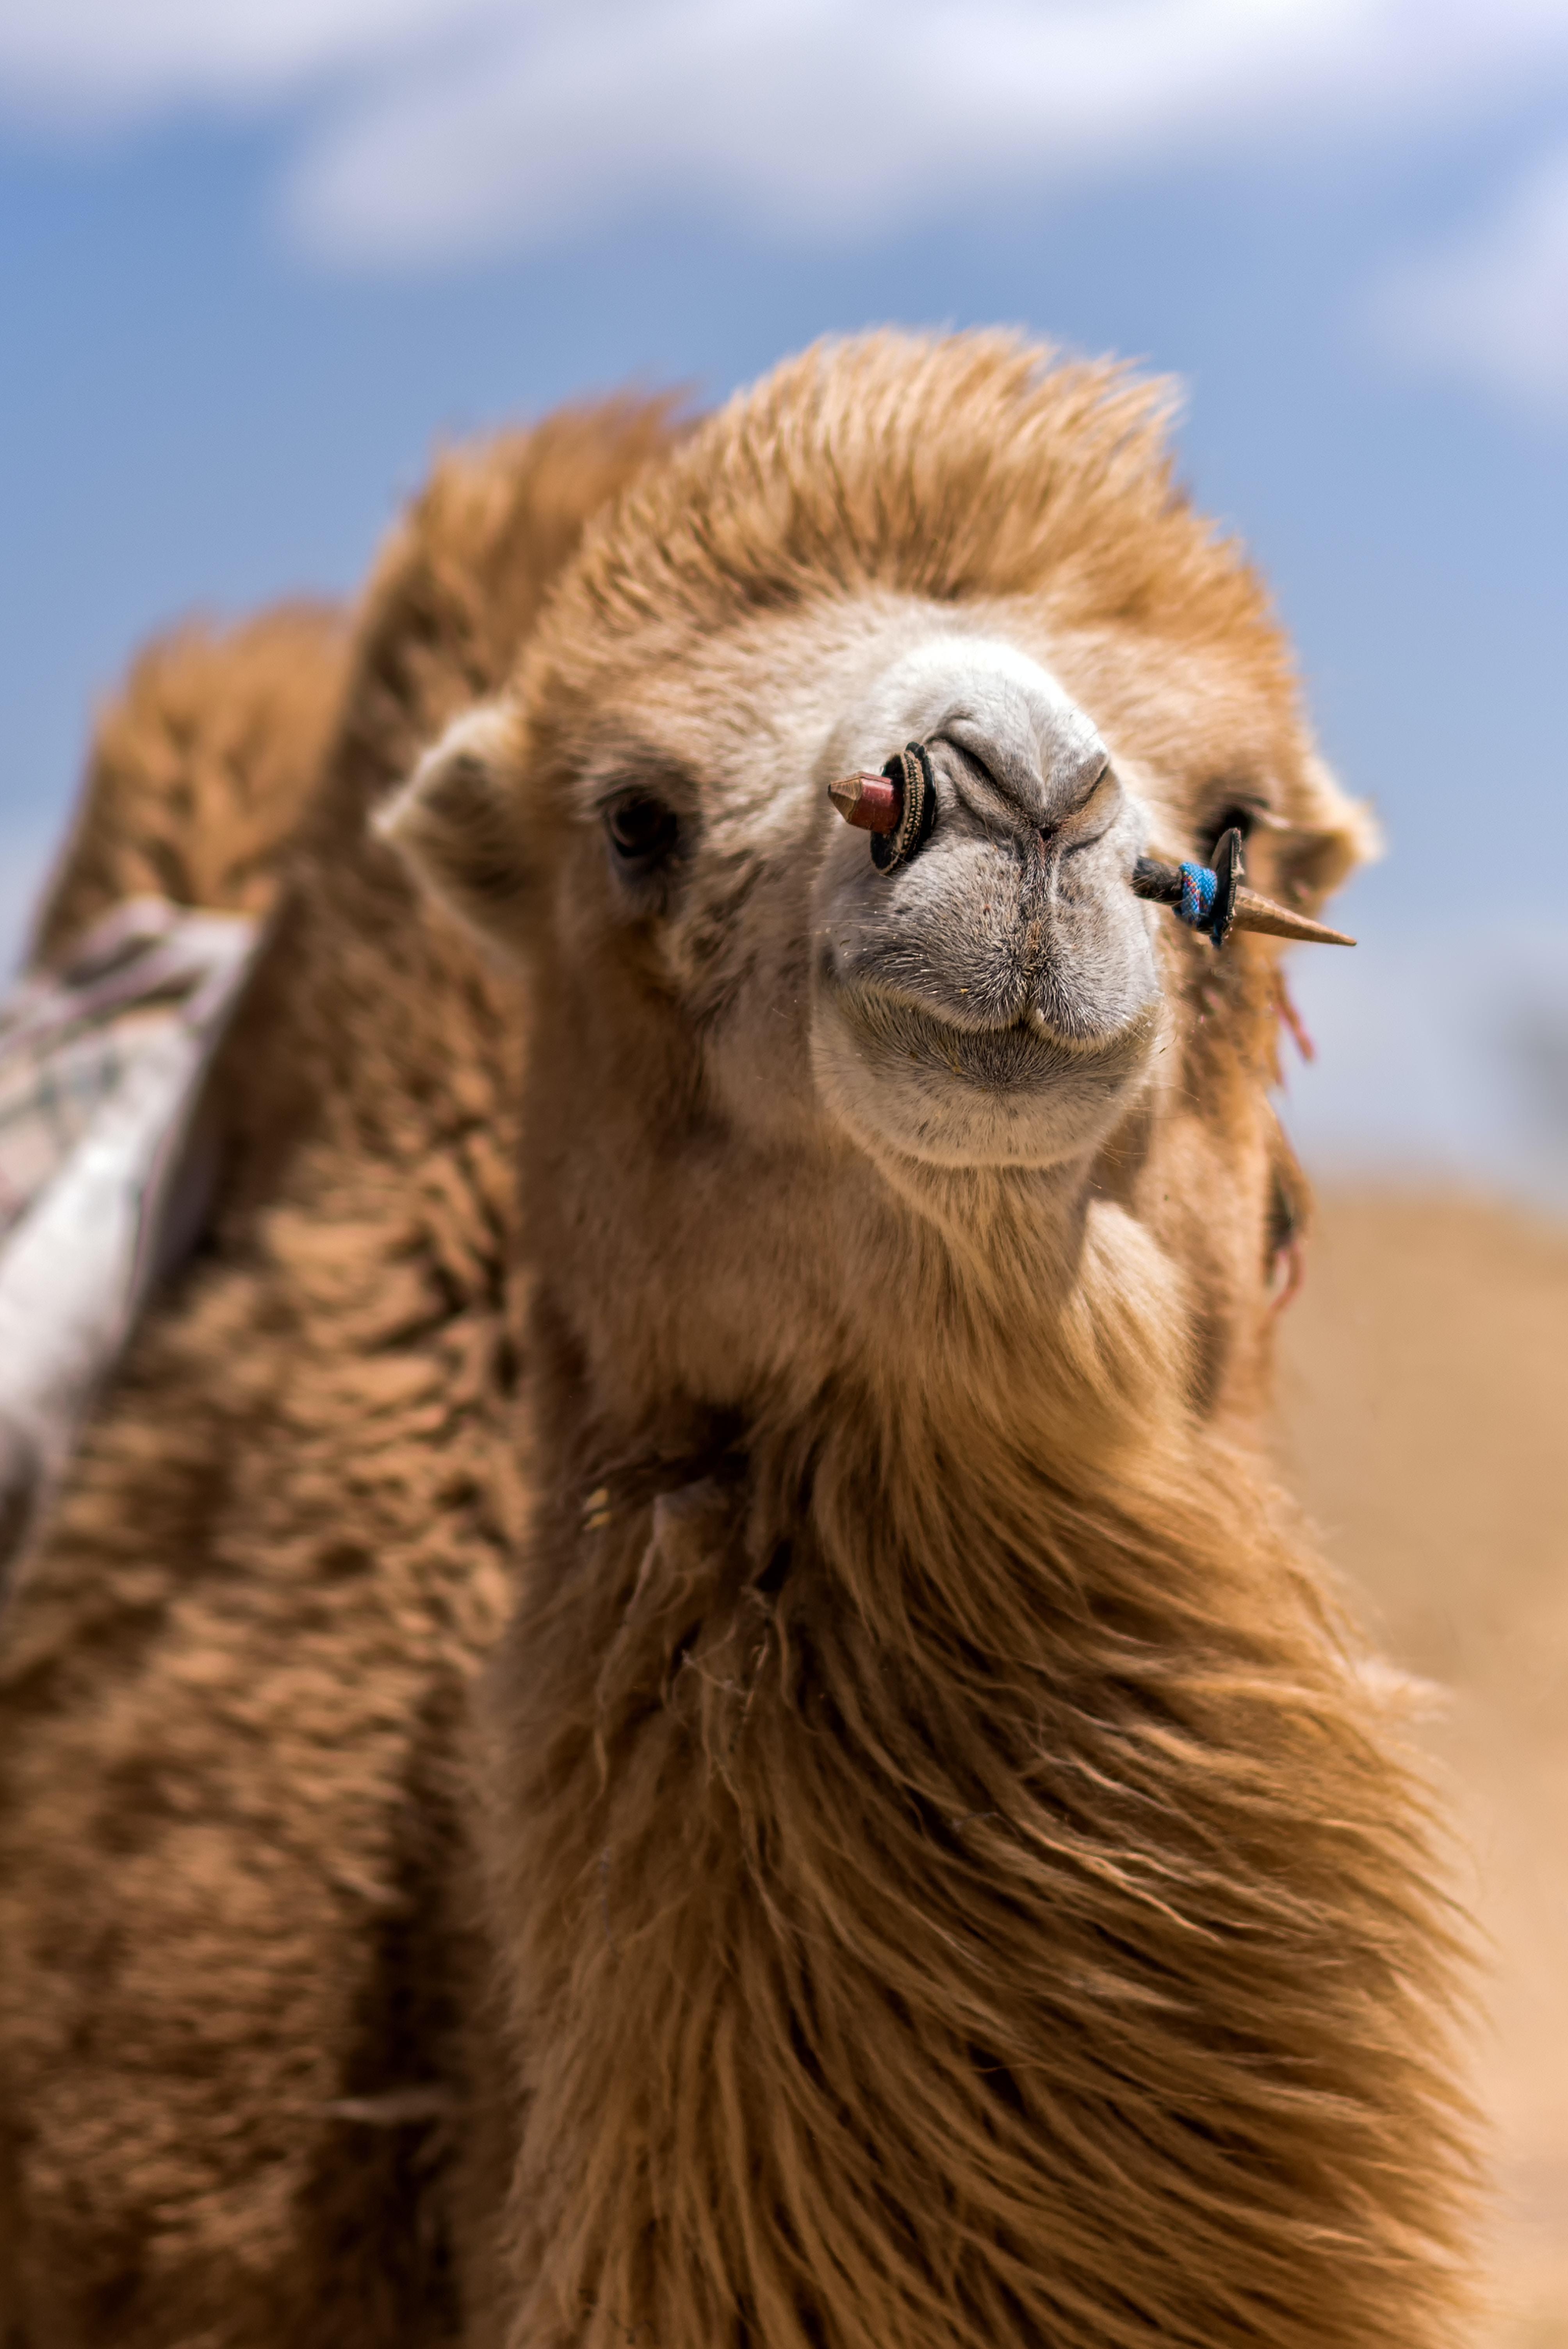 closeup photo of brown camel during daytime